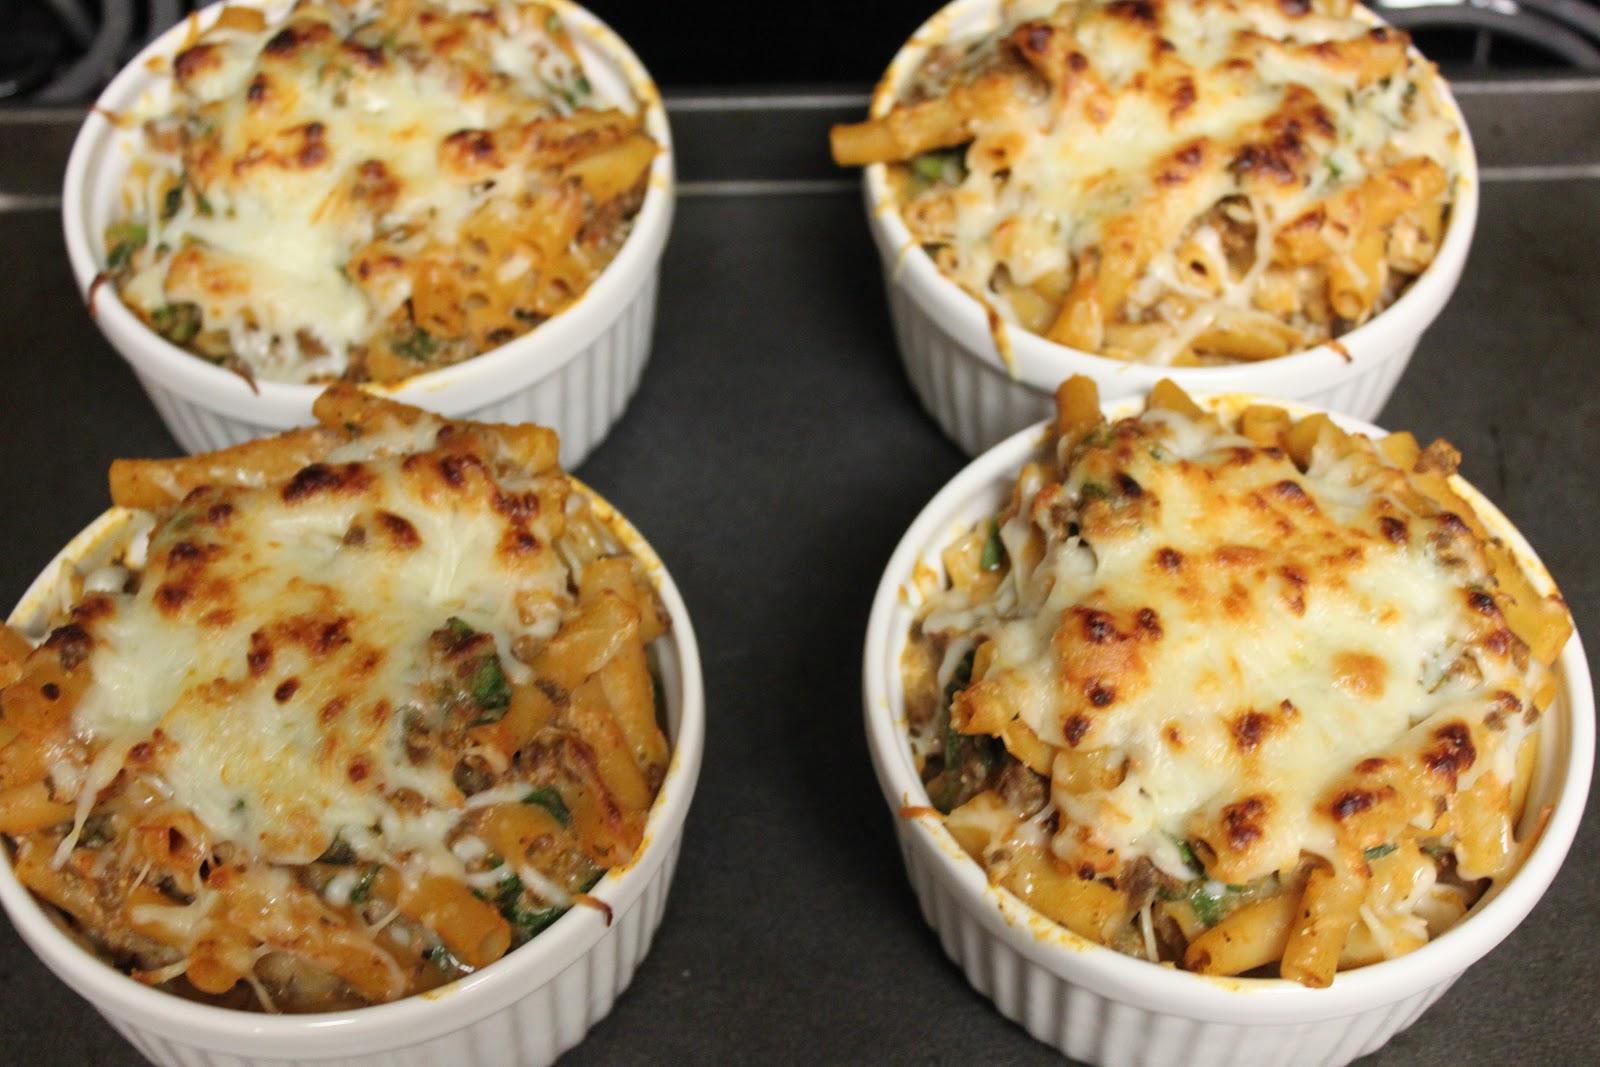 Three Marlenas: lasagna-style baked ziti